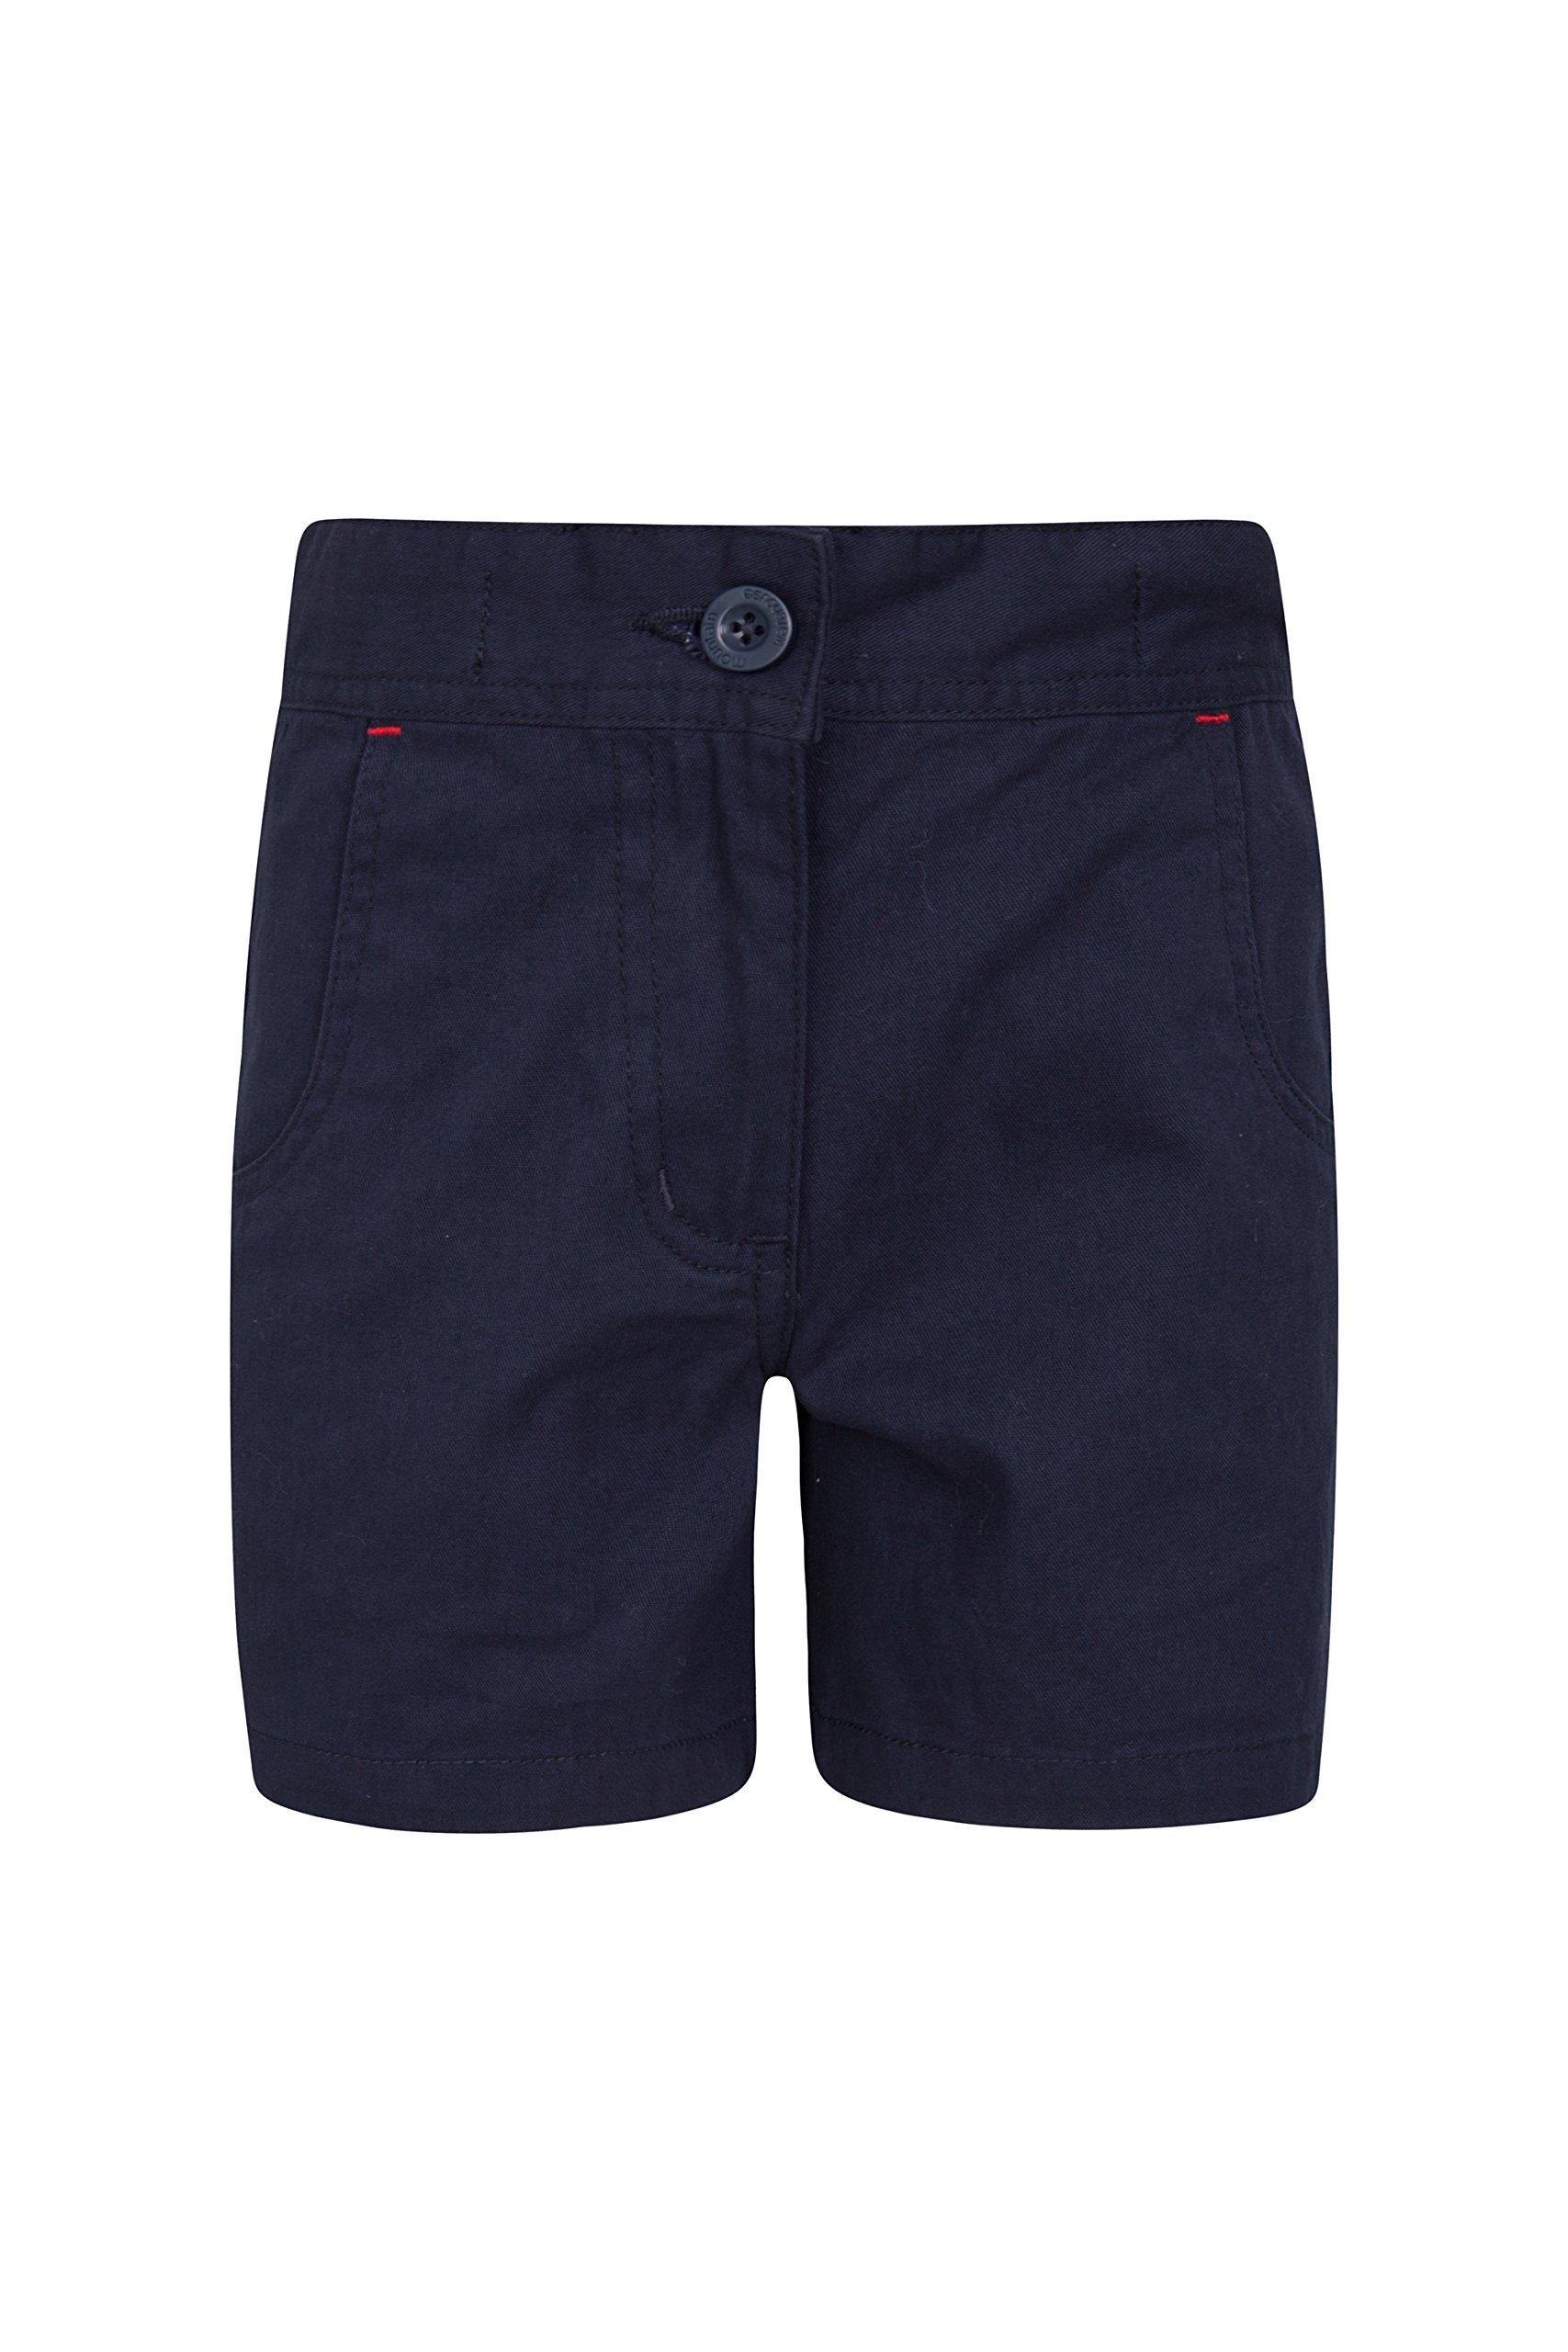 Mountain Warehouse Waterfall Girls Shorts - Durable Kids Hot Pants Navy 11-12 Years